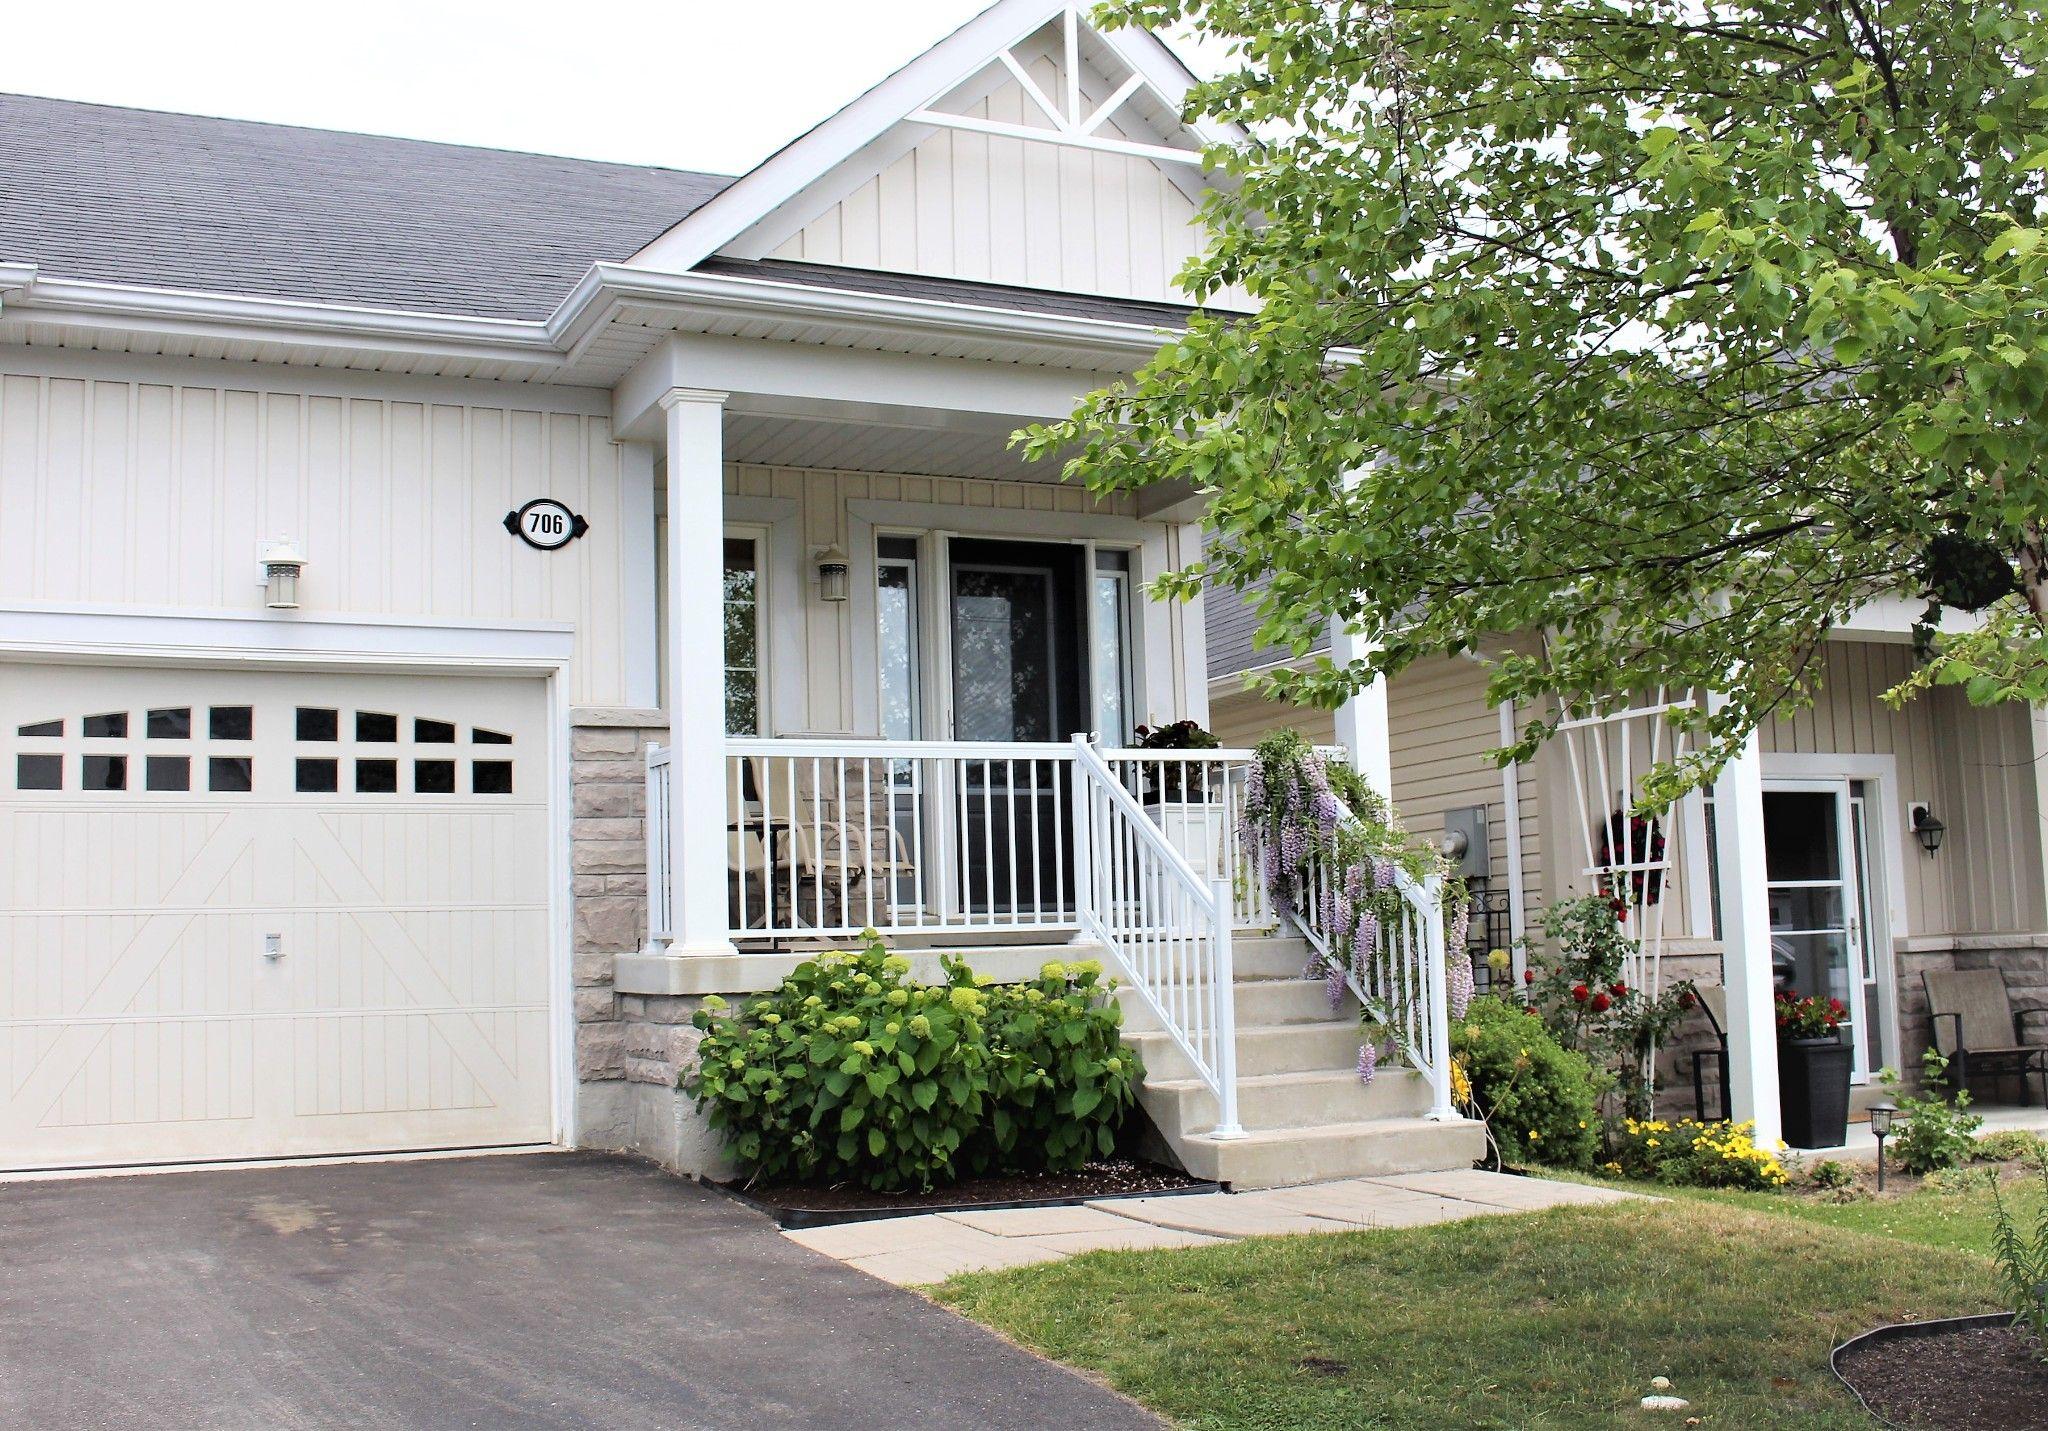 Main Photo: 706 Henderson Drive in Cobourg: Condo for sale : MLS®# X5290750